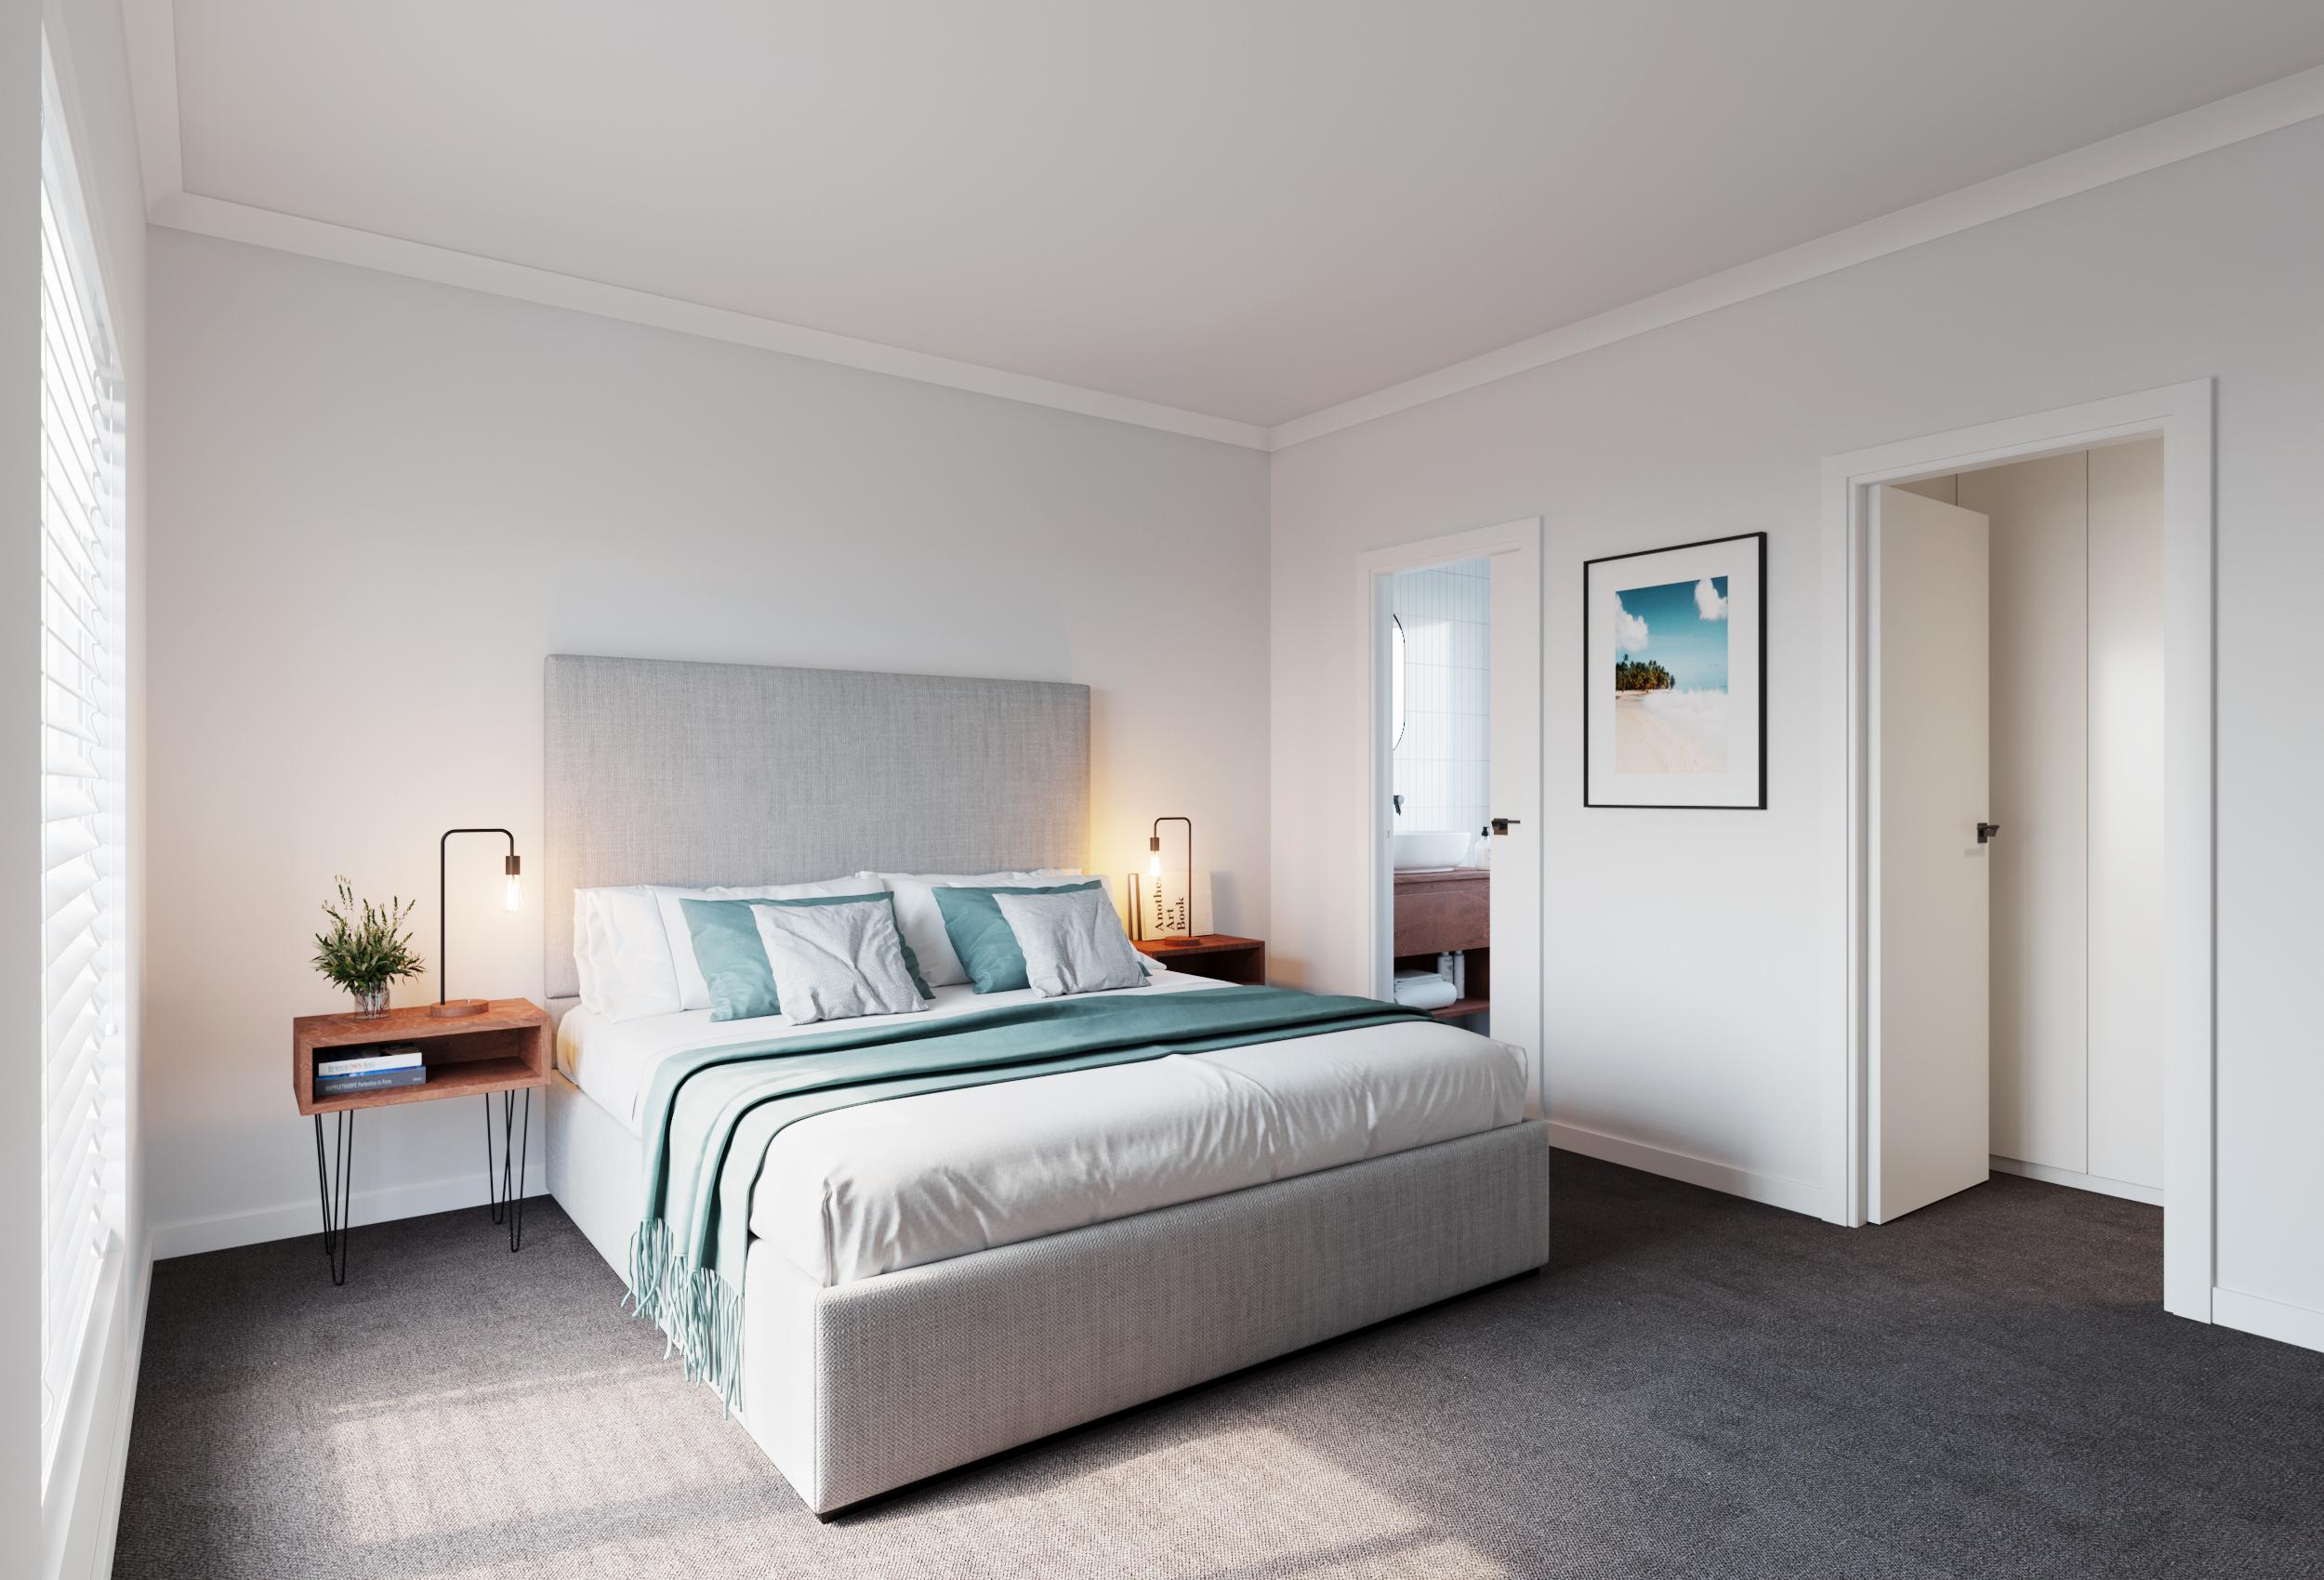 UNIT 1 BEDROOM 1